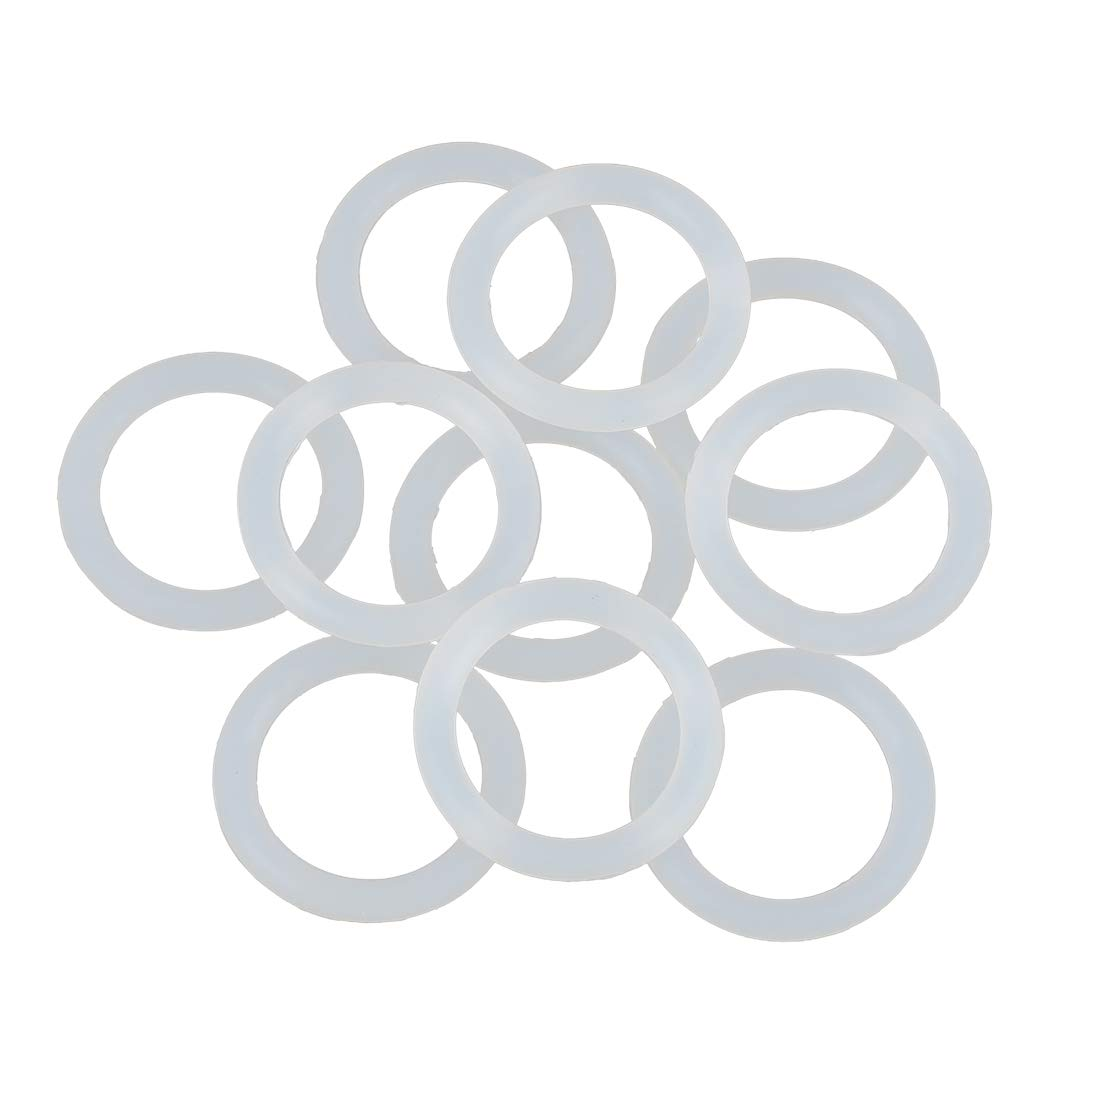 10 Juntas de Junta t/órica de Goma de Silicona Blanca para Coche X AUTOHAUX 29 mm x 4 mm